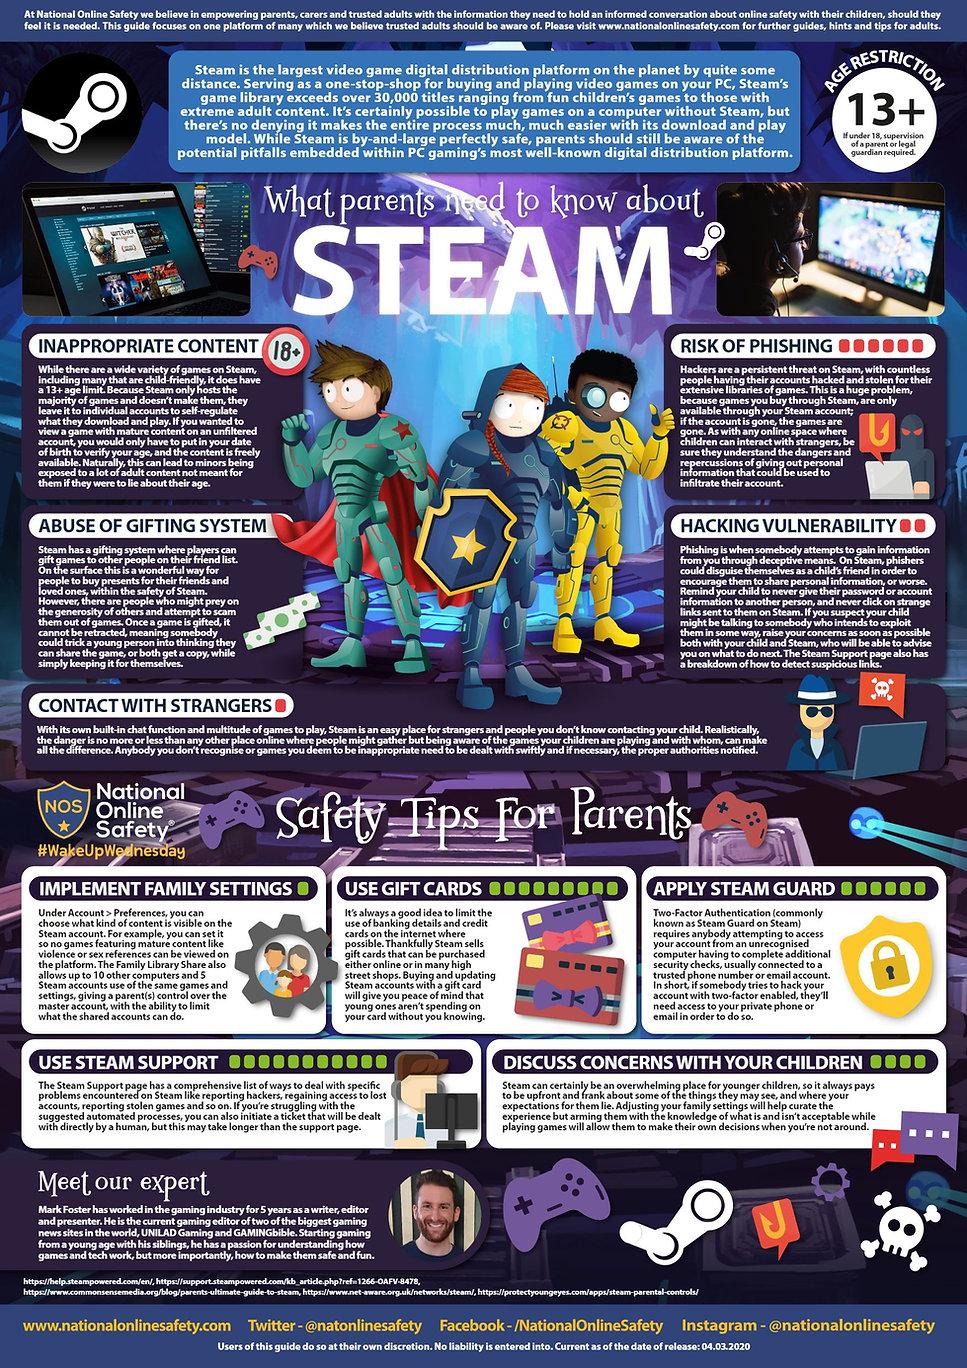 Steam Gaming Platform - Parental Advice-